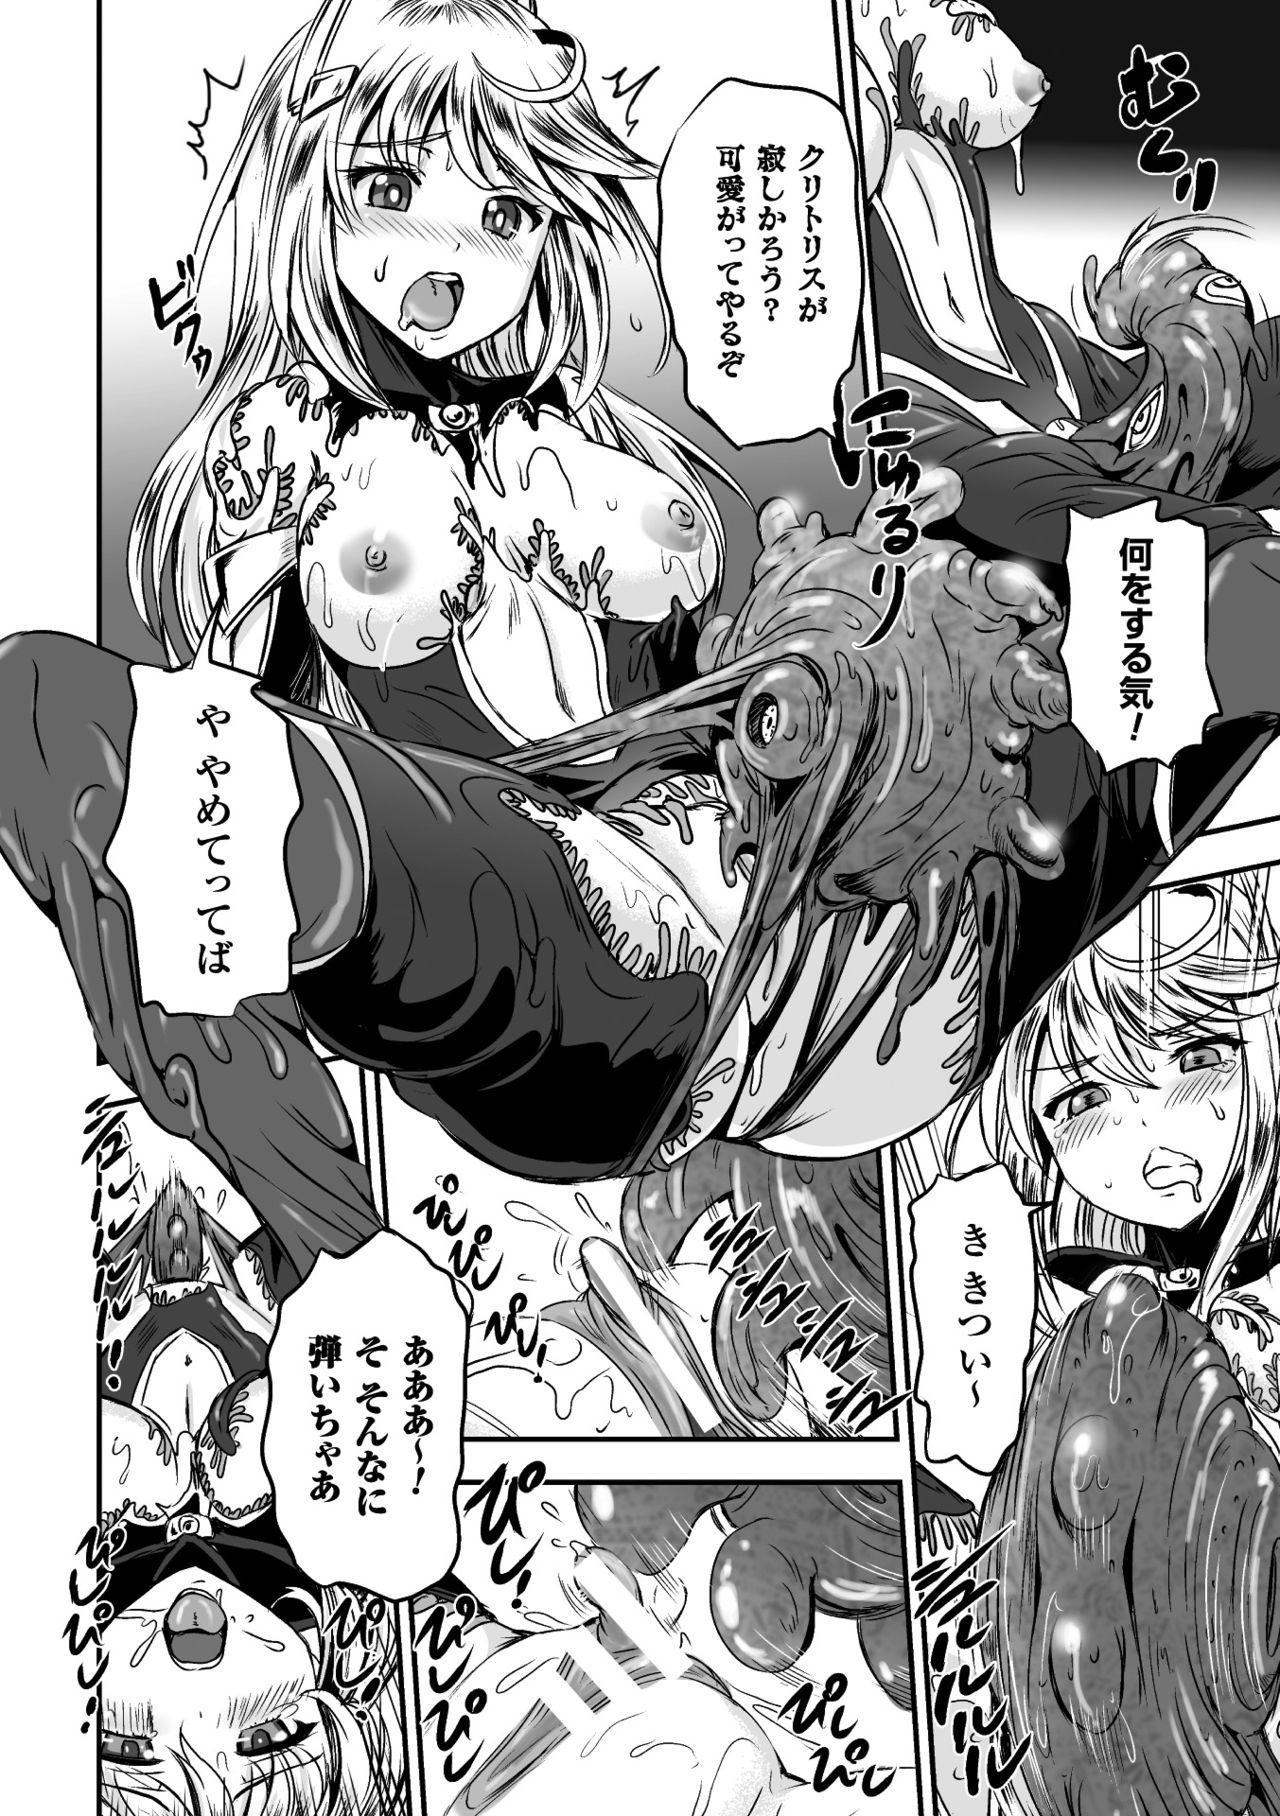 2D Comic Magazine Shokushu Yoroi ni Zenshin o Okasare Mugen Zecchou! Vol. 5 33